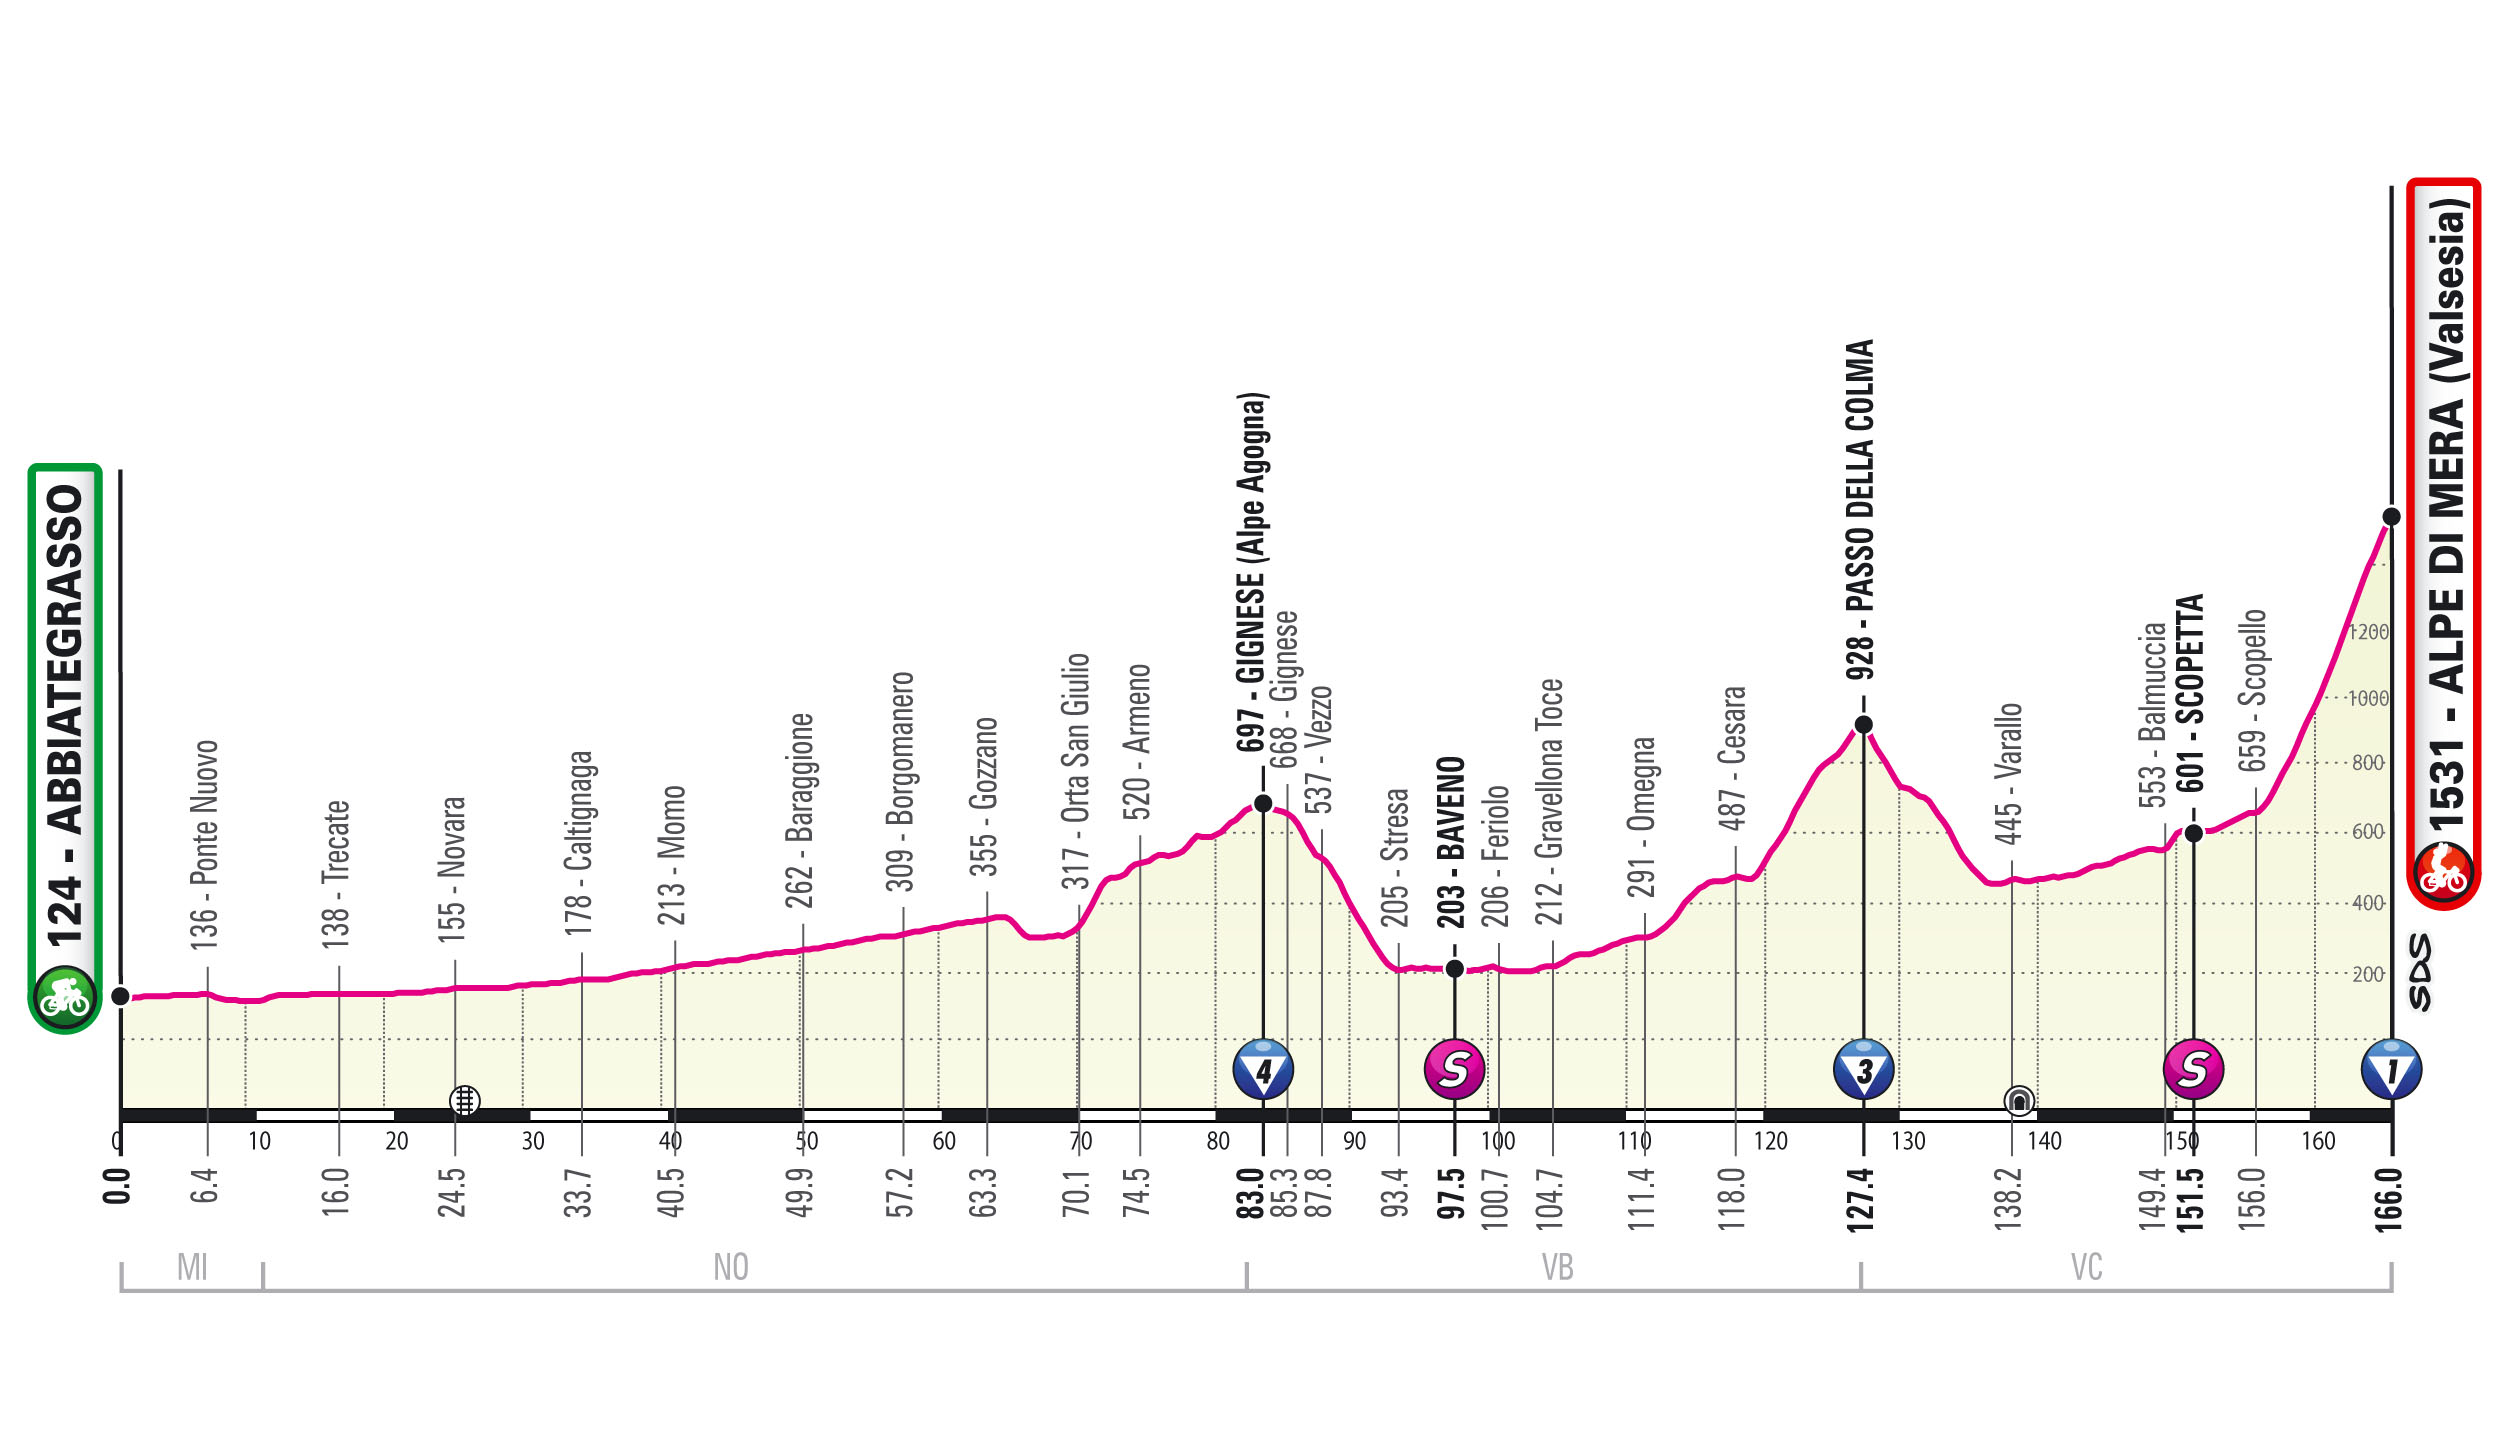 Giro d'Italia 2021 stage 19 revised profile map